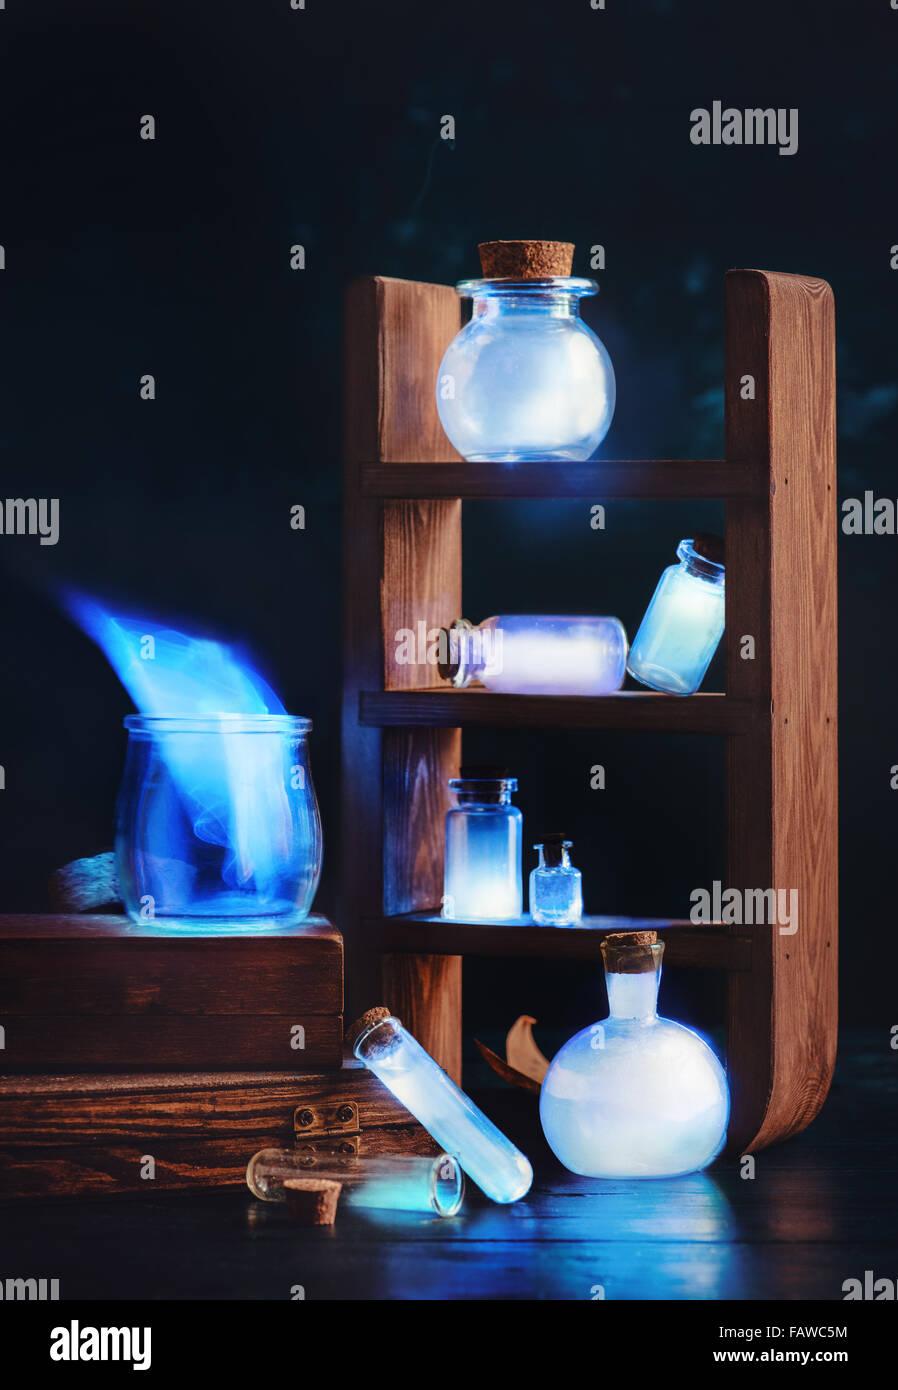 Glowing recuerdos Imagen De Stock